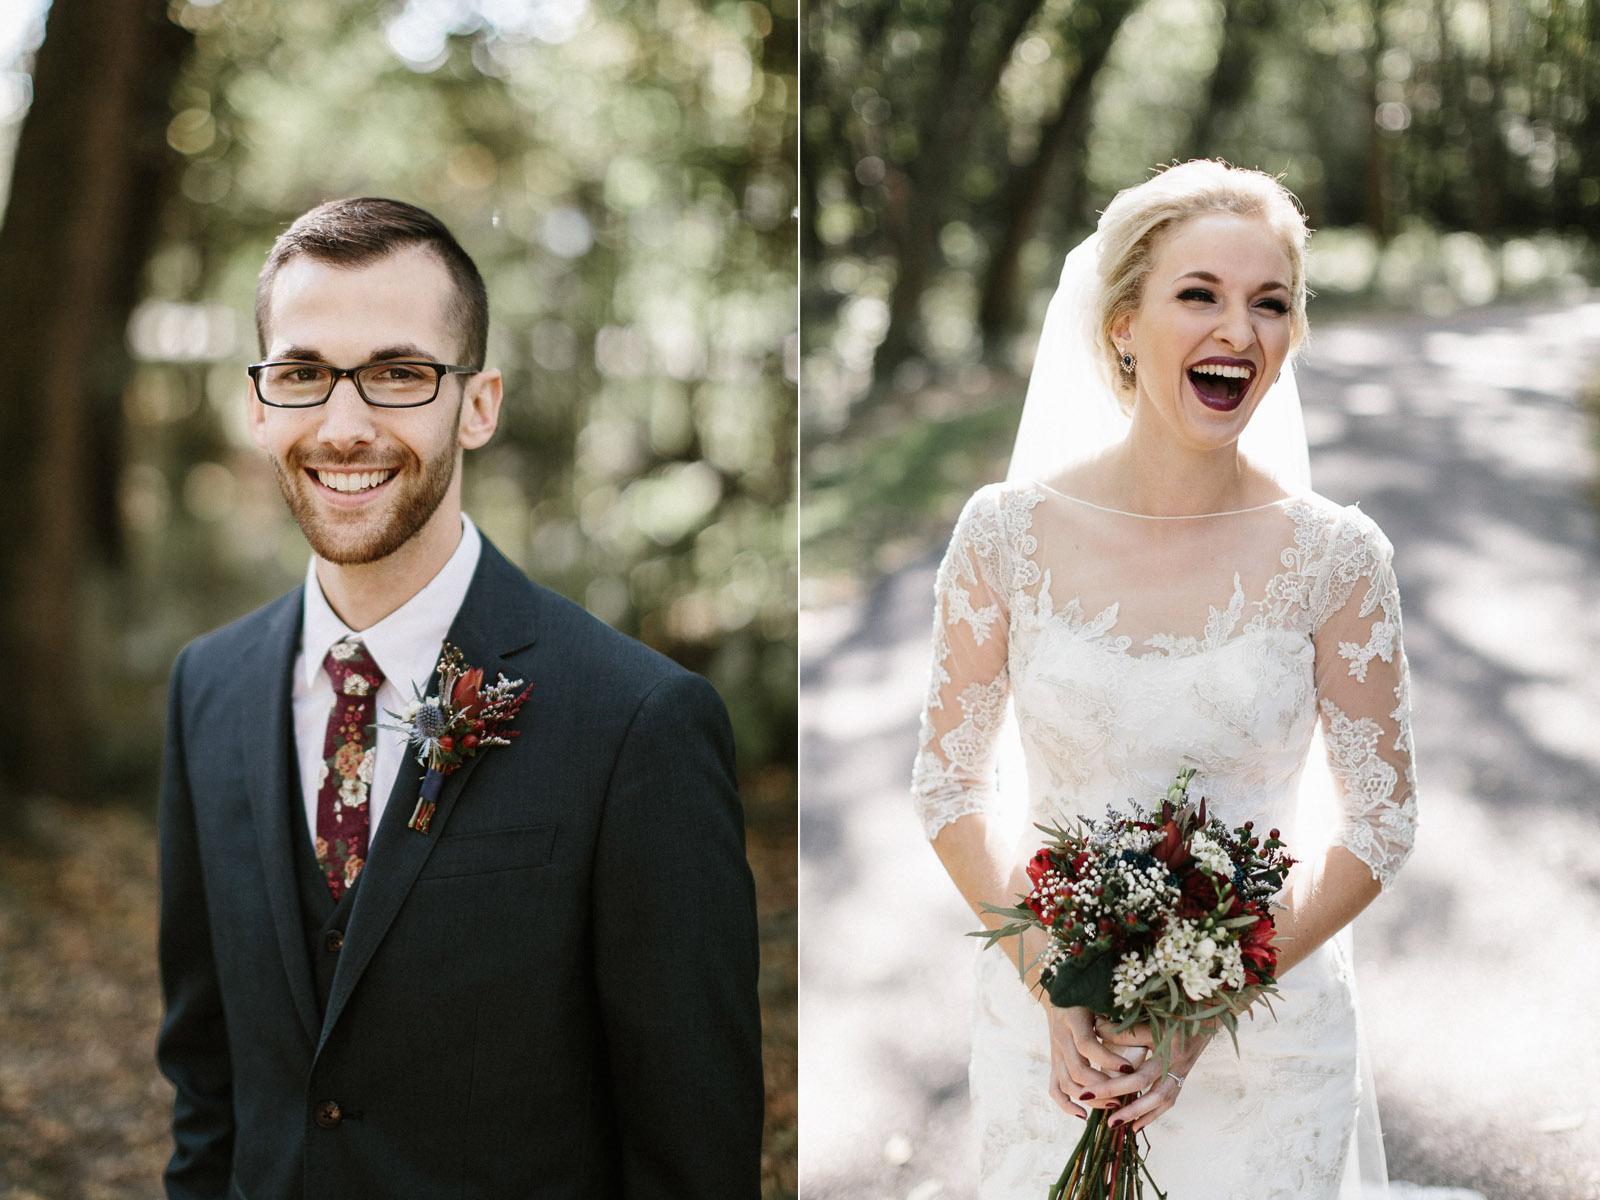 Jenna&Austin_SiouxFalls_Wedding_Photographer_057.jpg